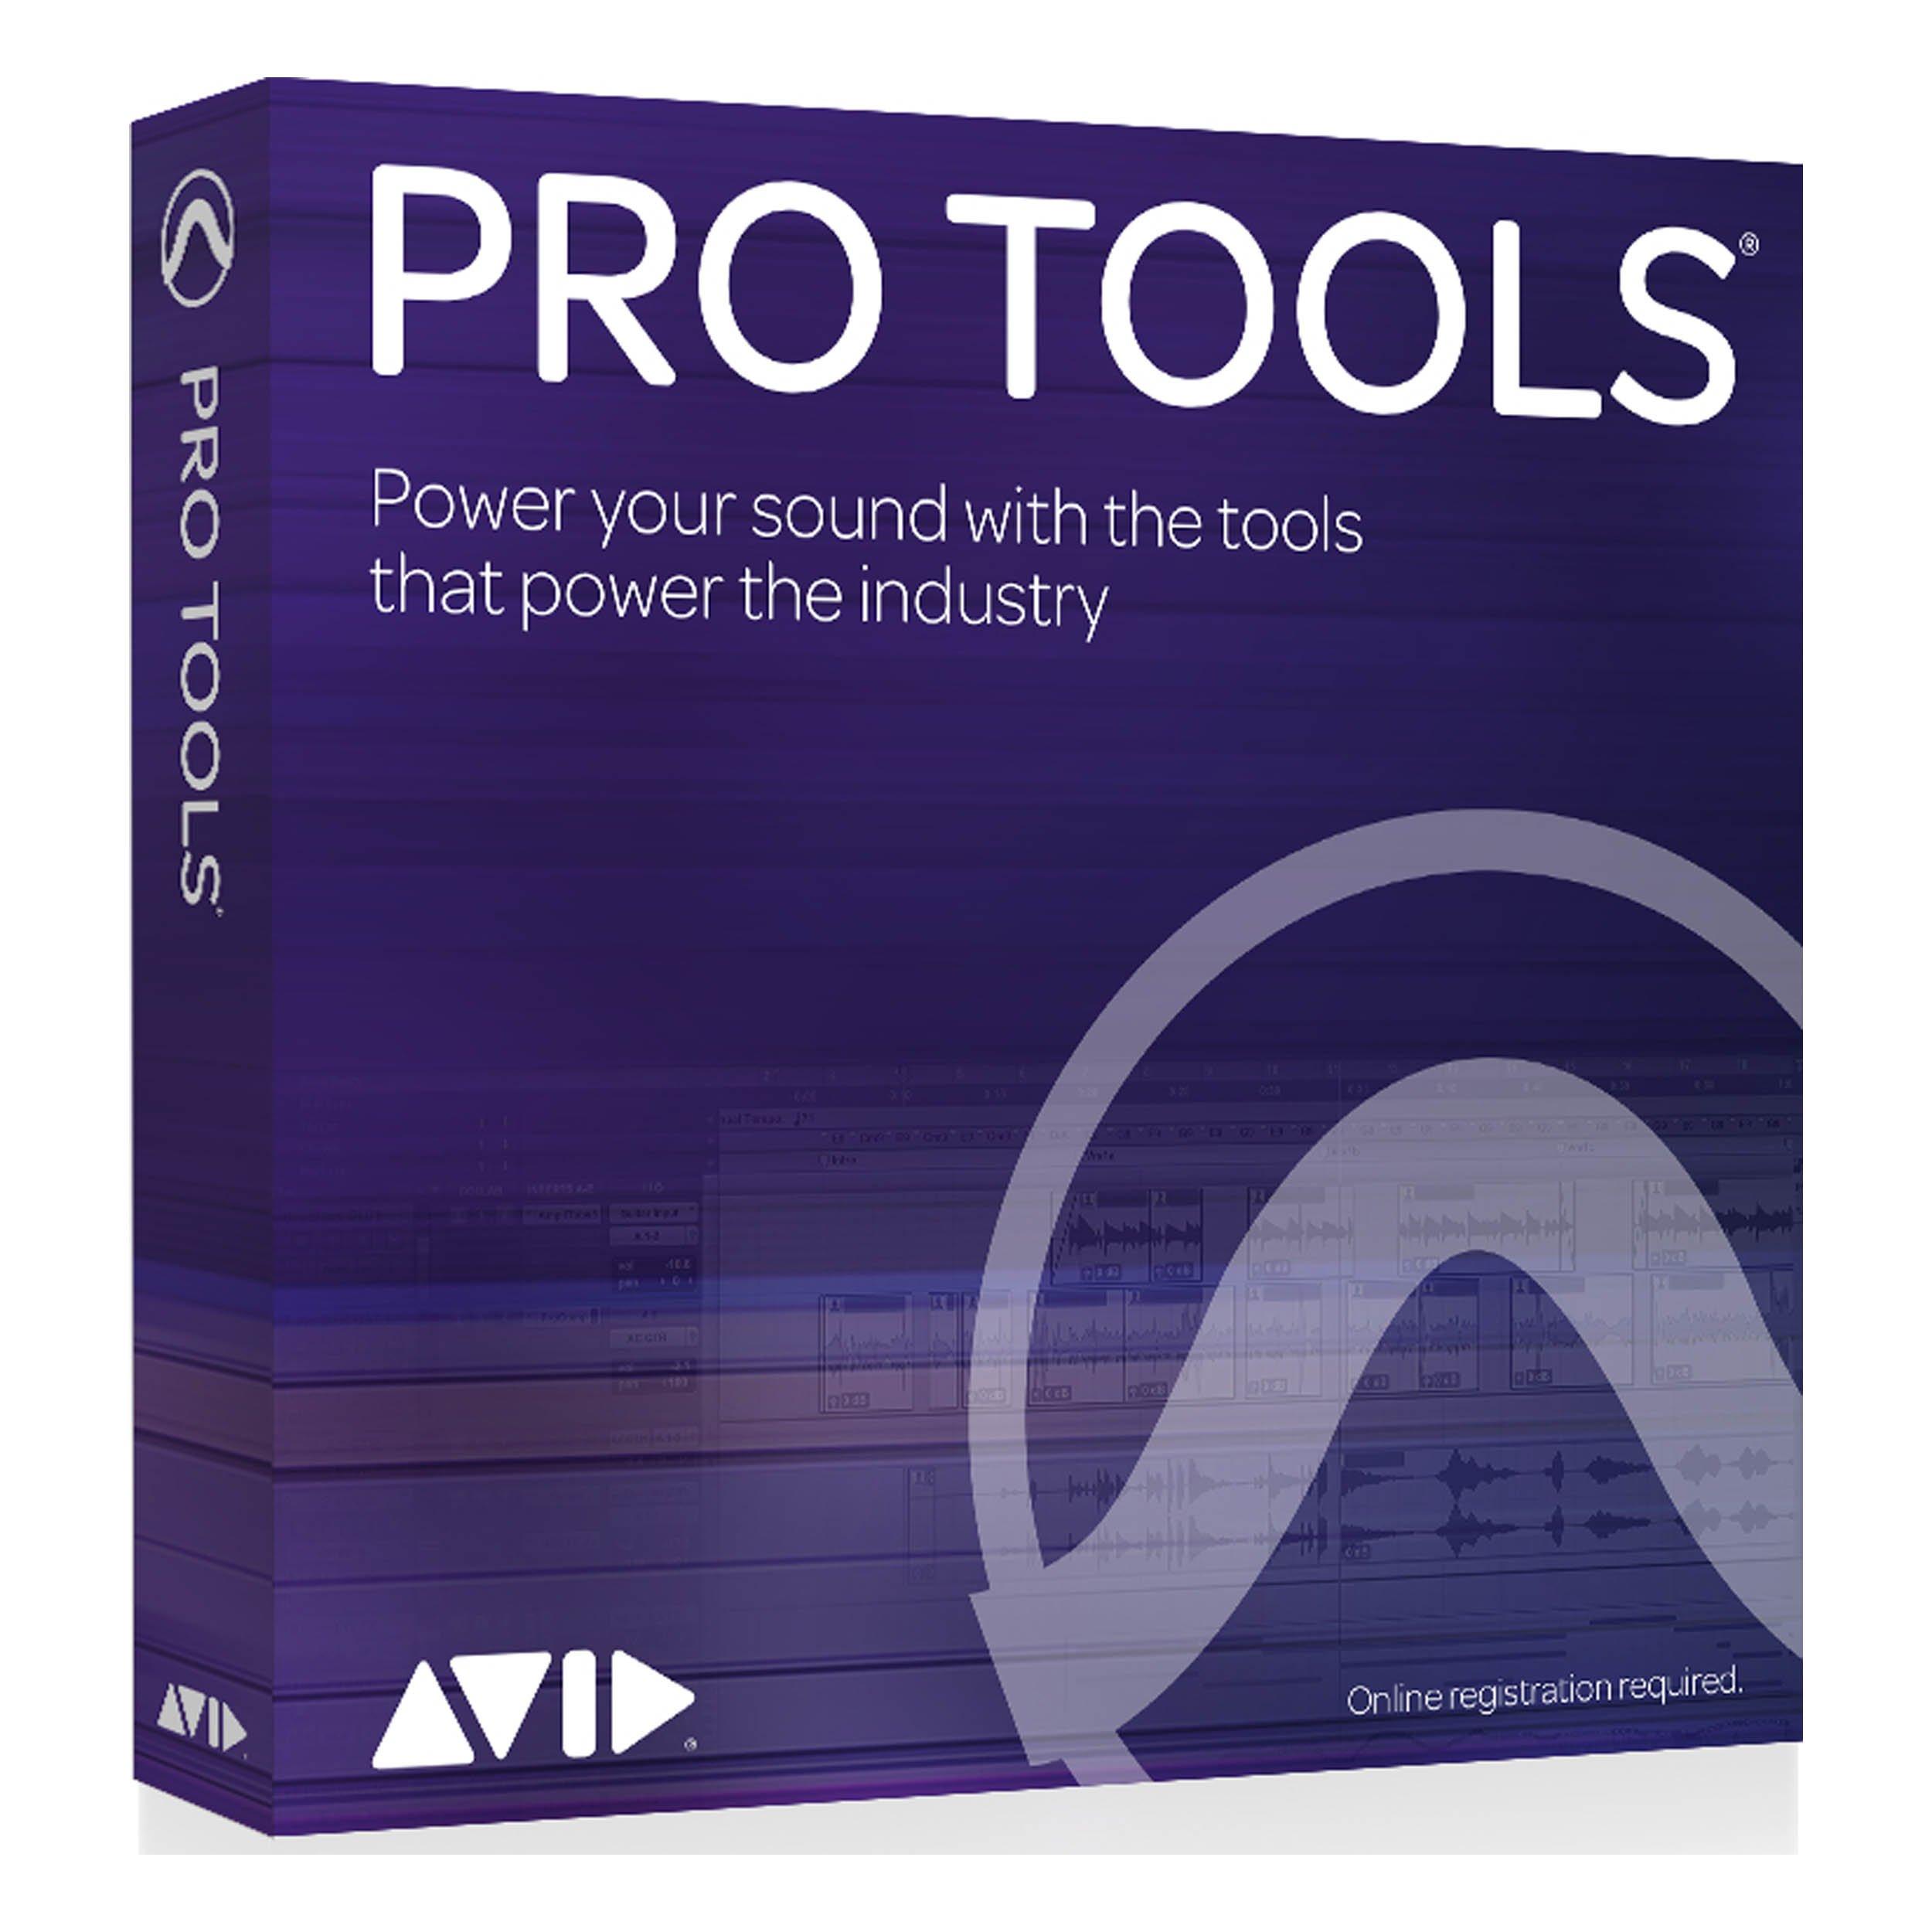 Avid 99356608700 Pro Tools Upgrade Plan Reinstatement